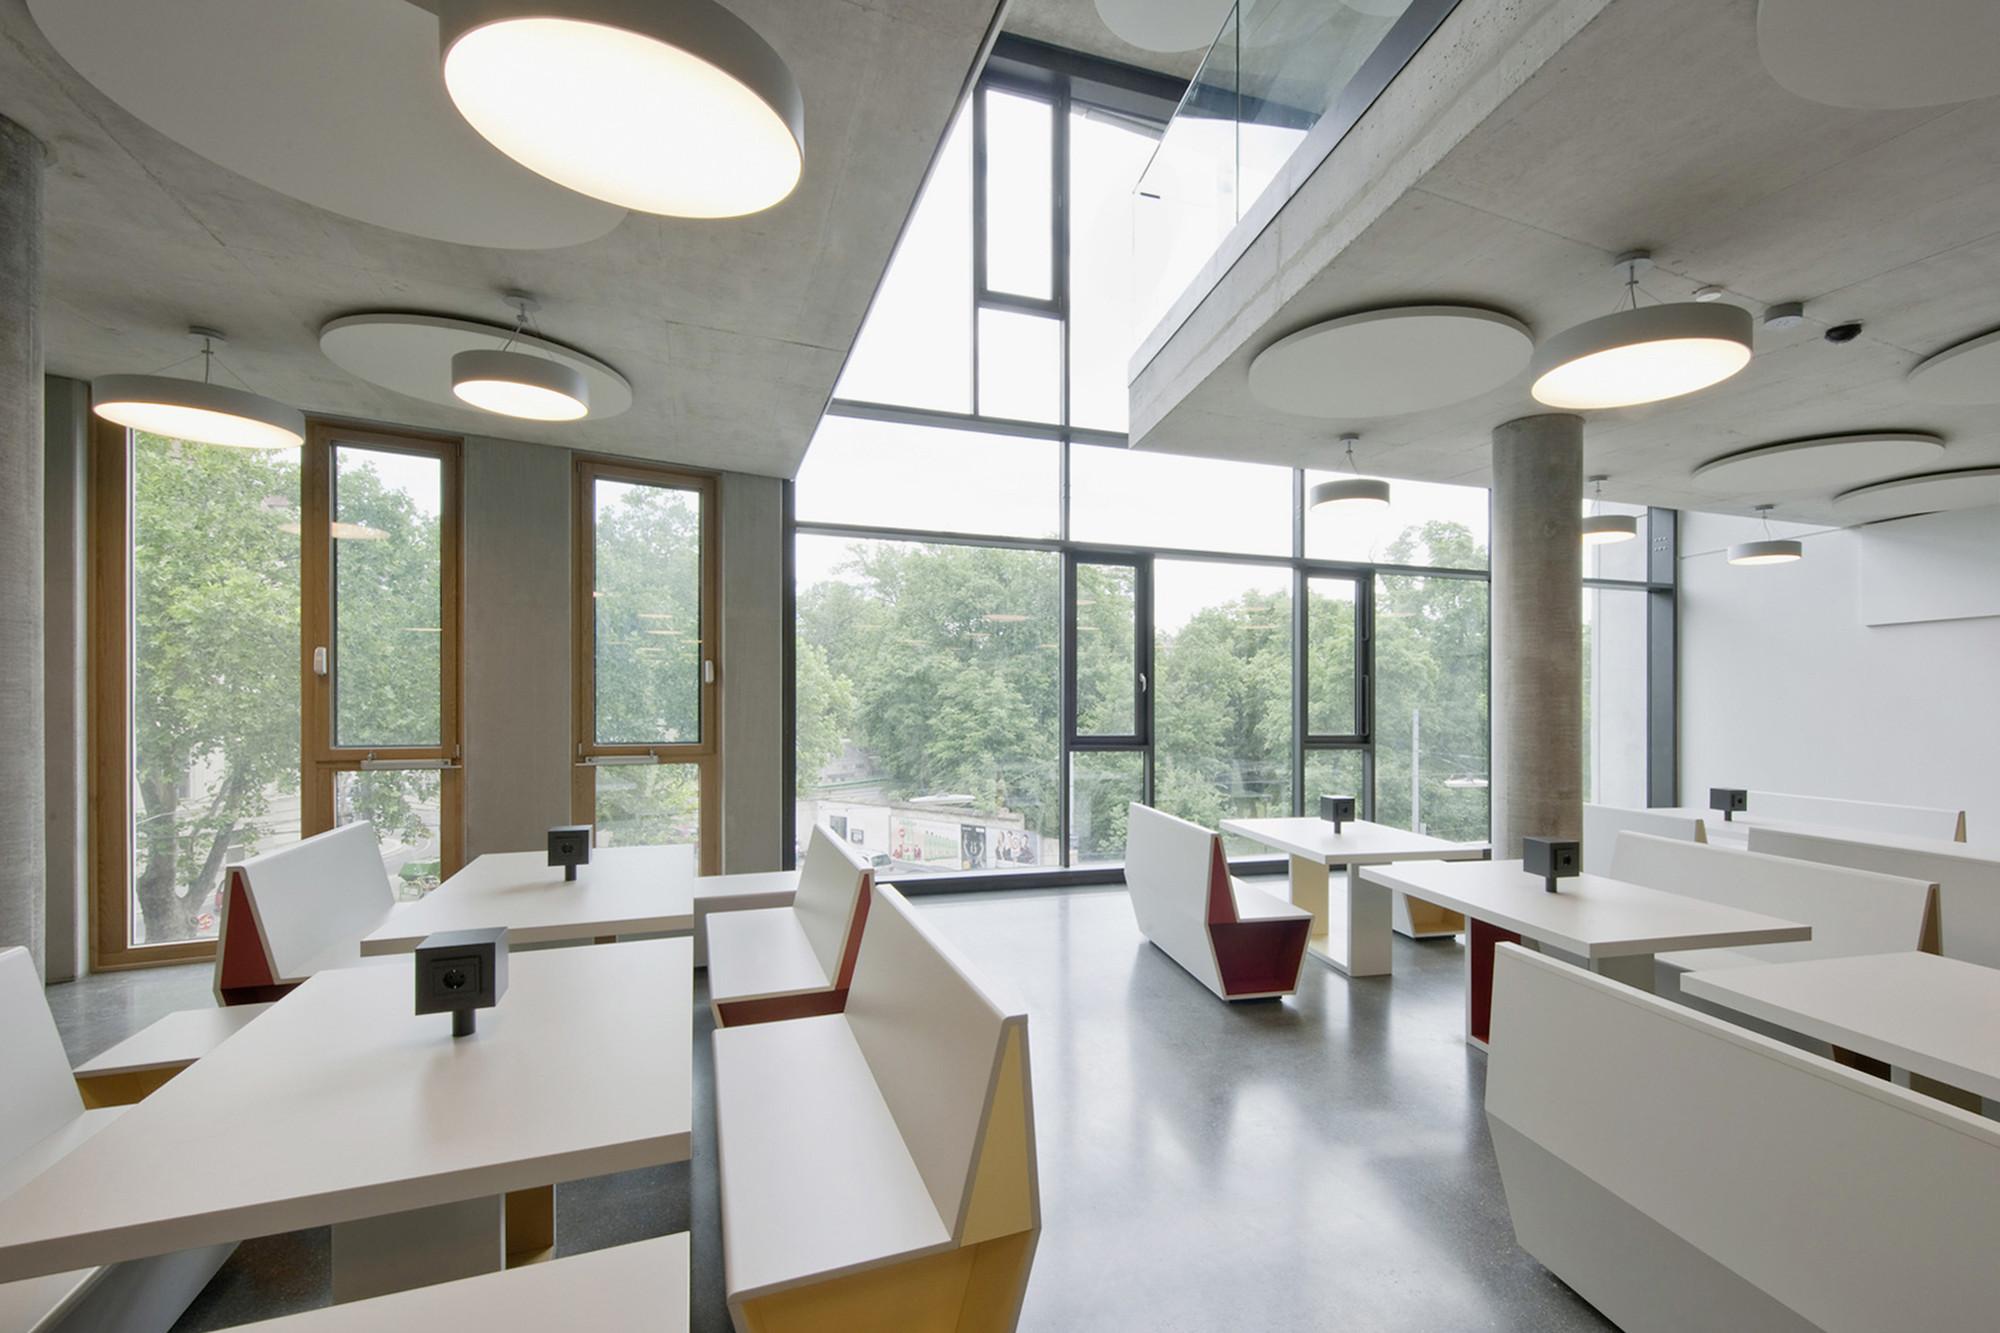 Department Building Waehringerstrasse 29 / NMPB Architekten, Courtesy of NMPB  Architekten